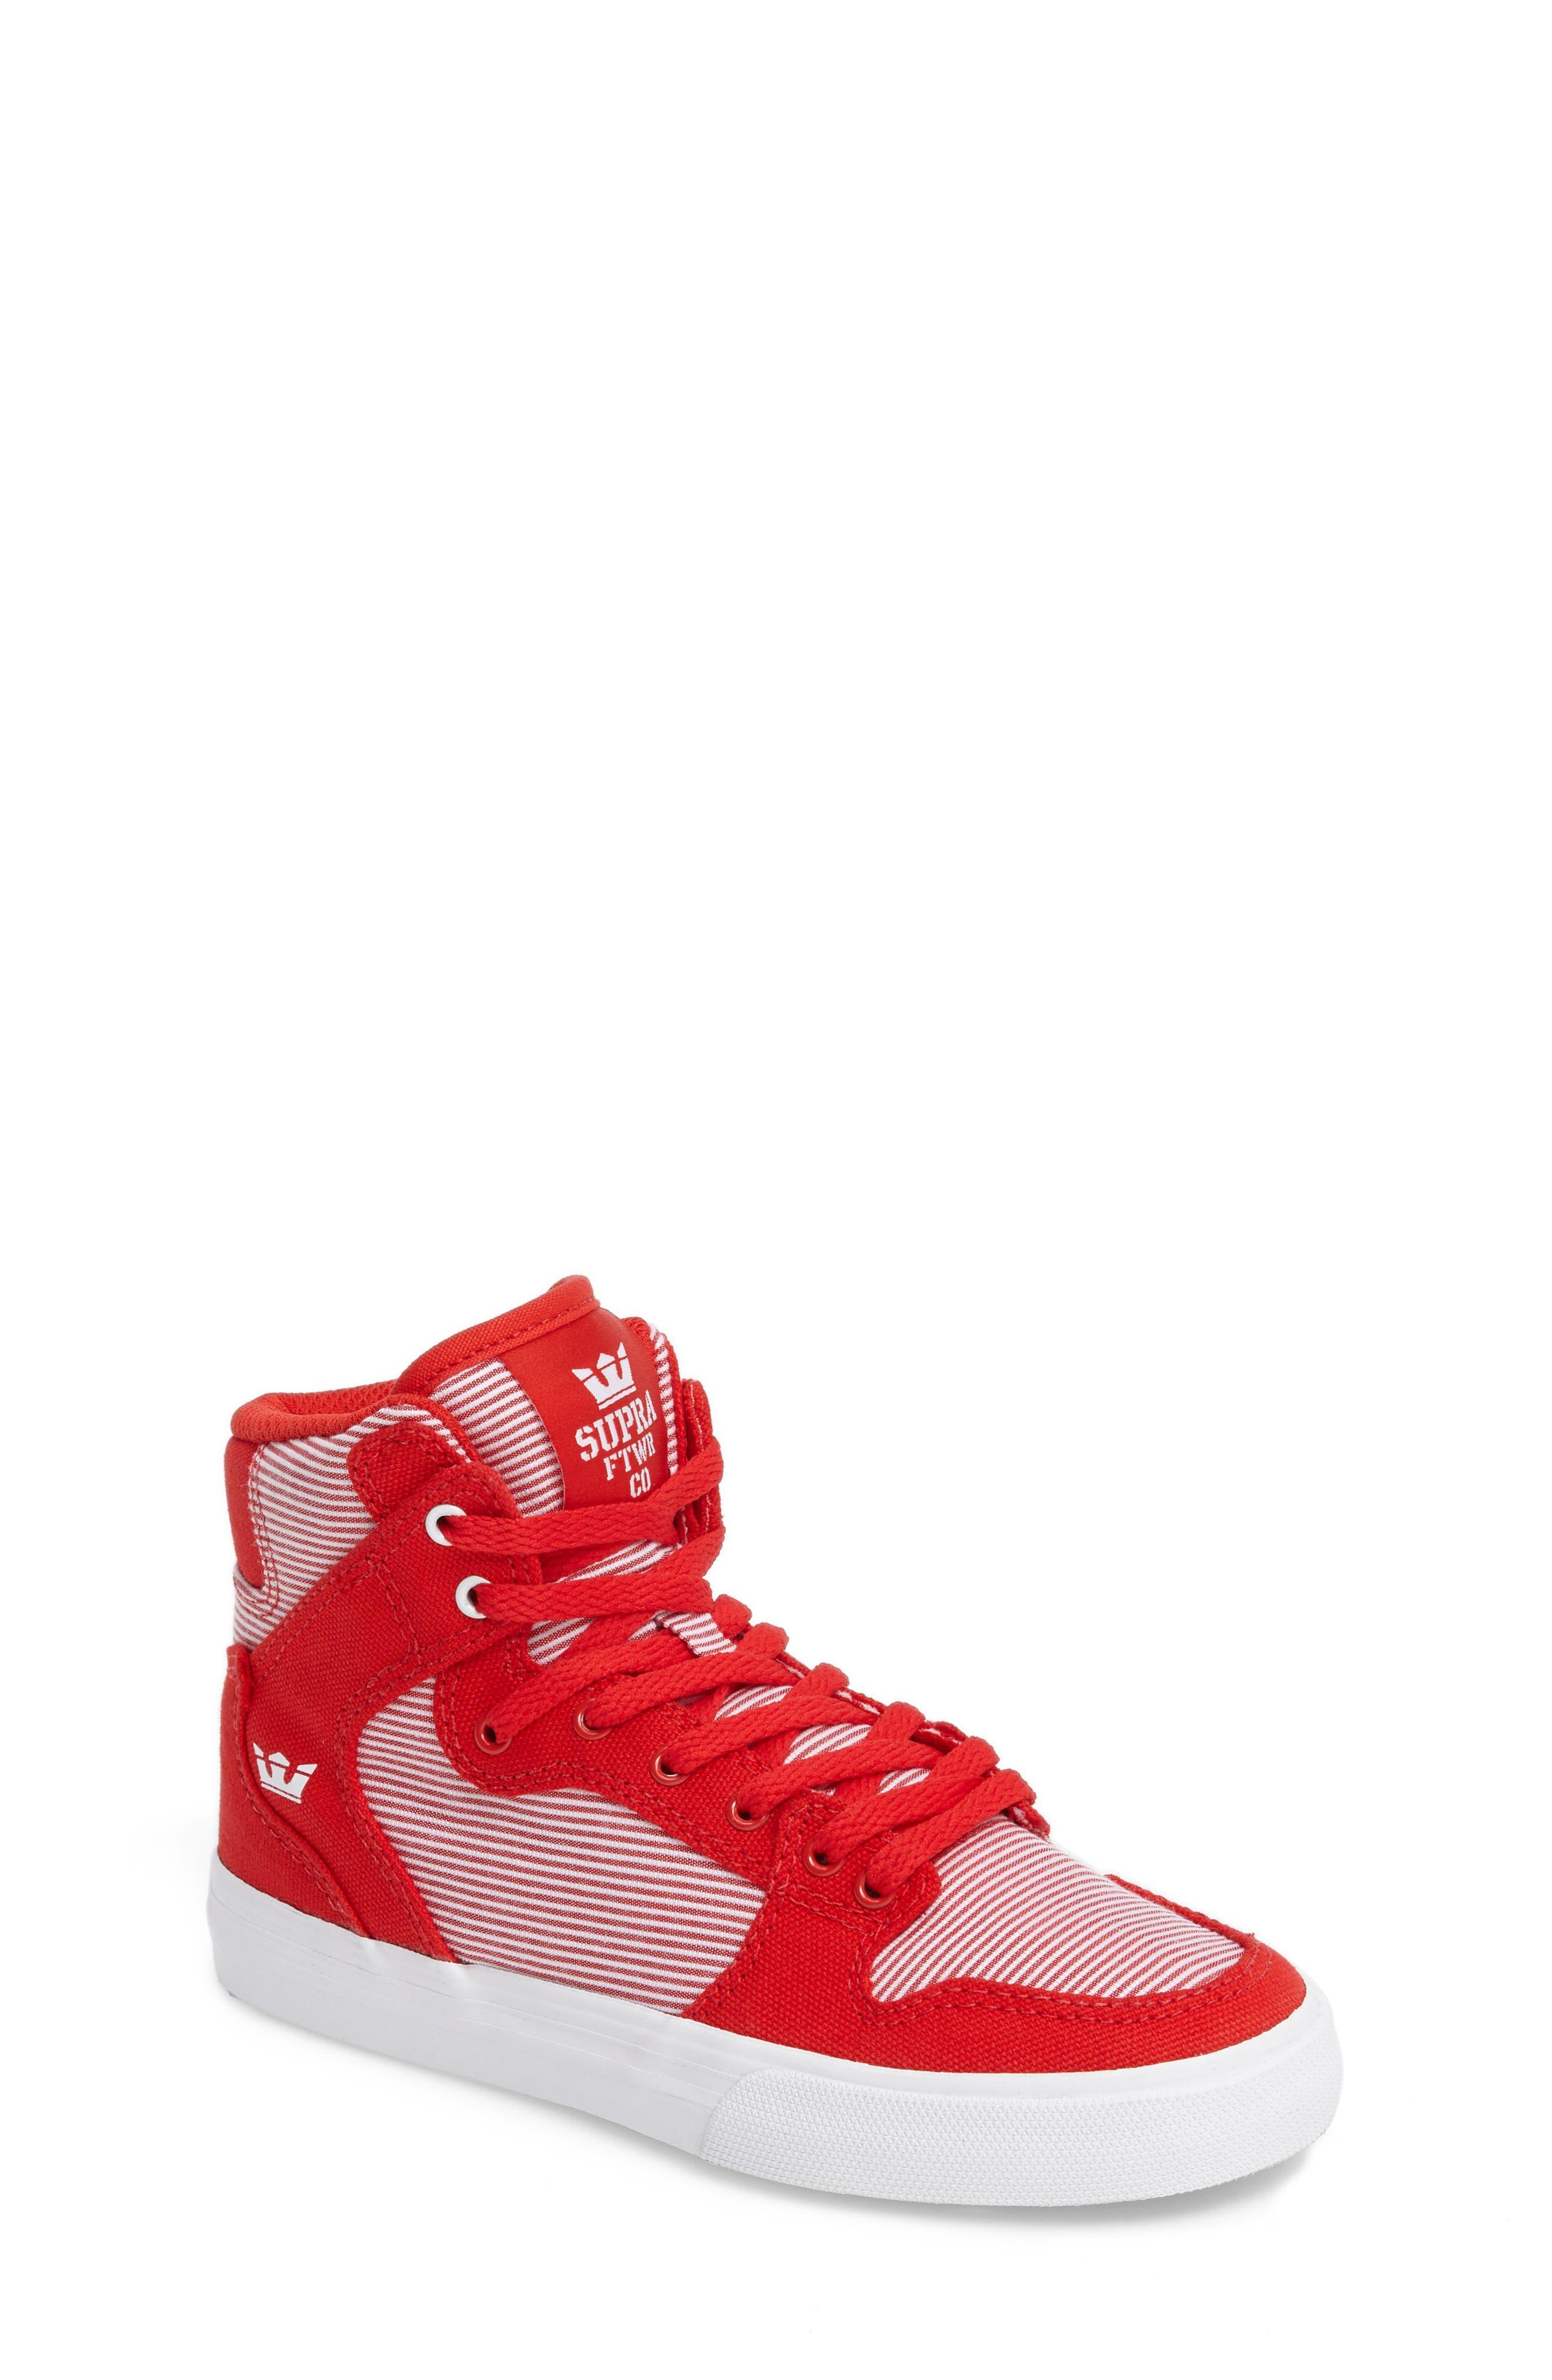 Vaider High Top Sneaker,                             Main thumbnail 1, color,                             602